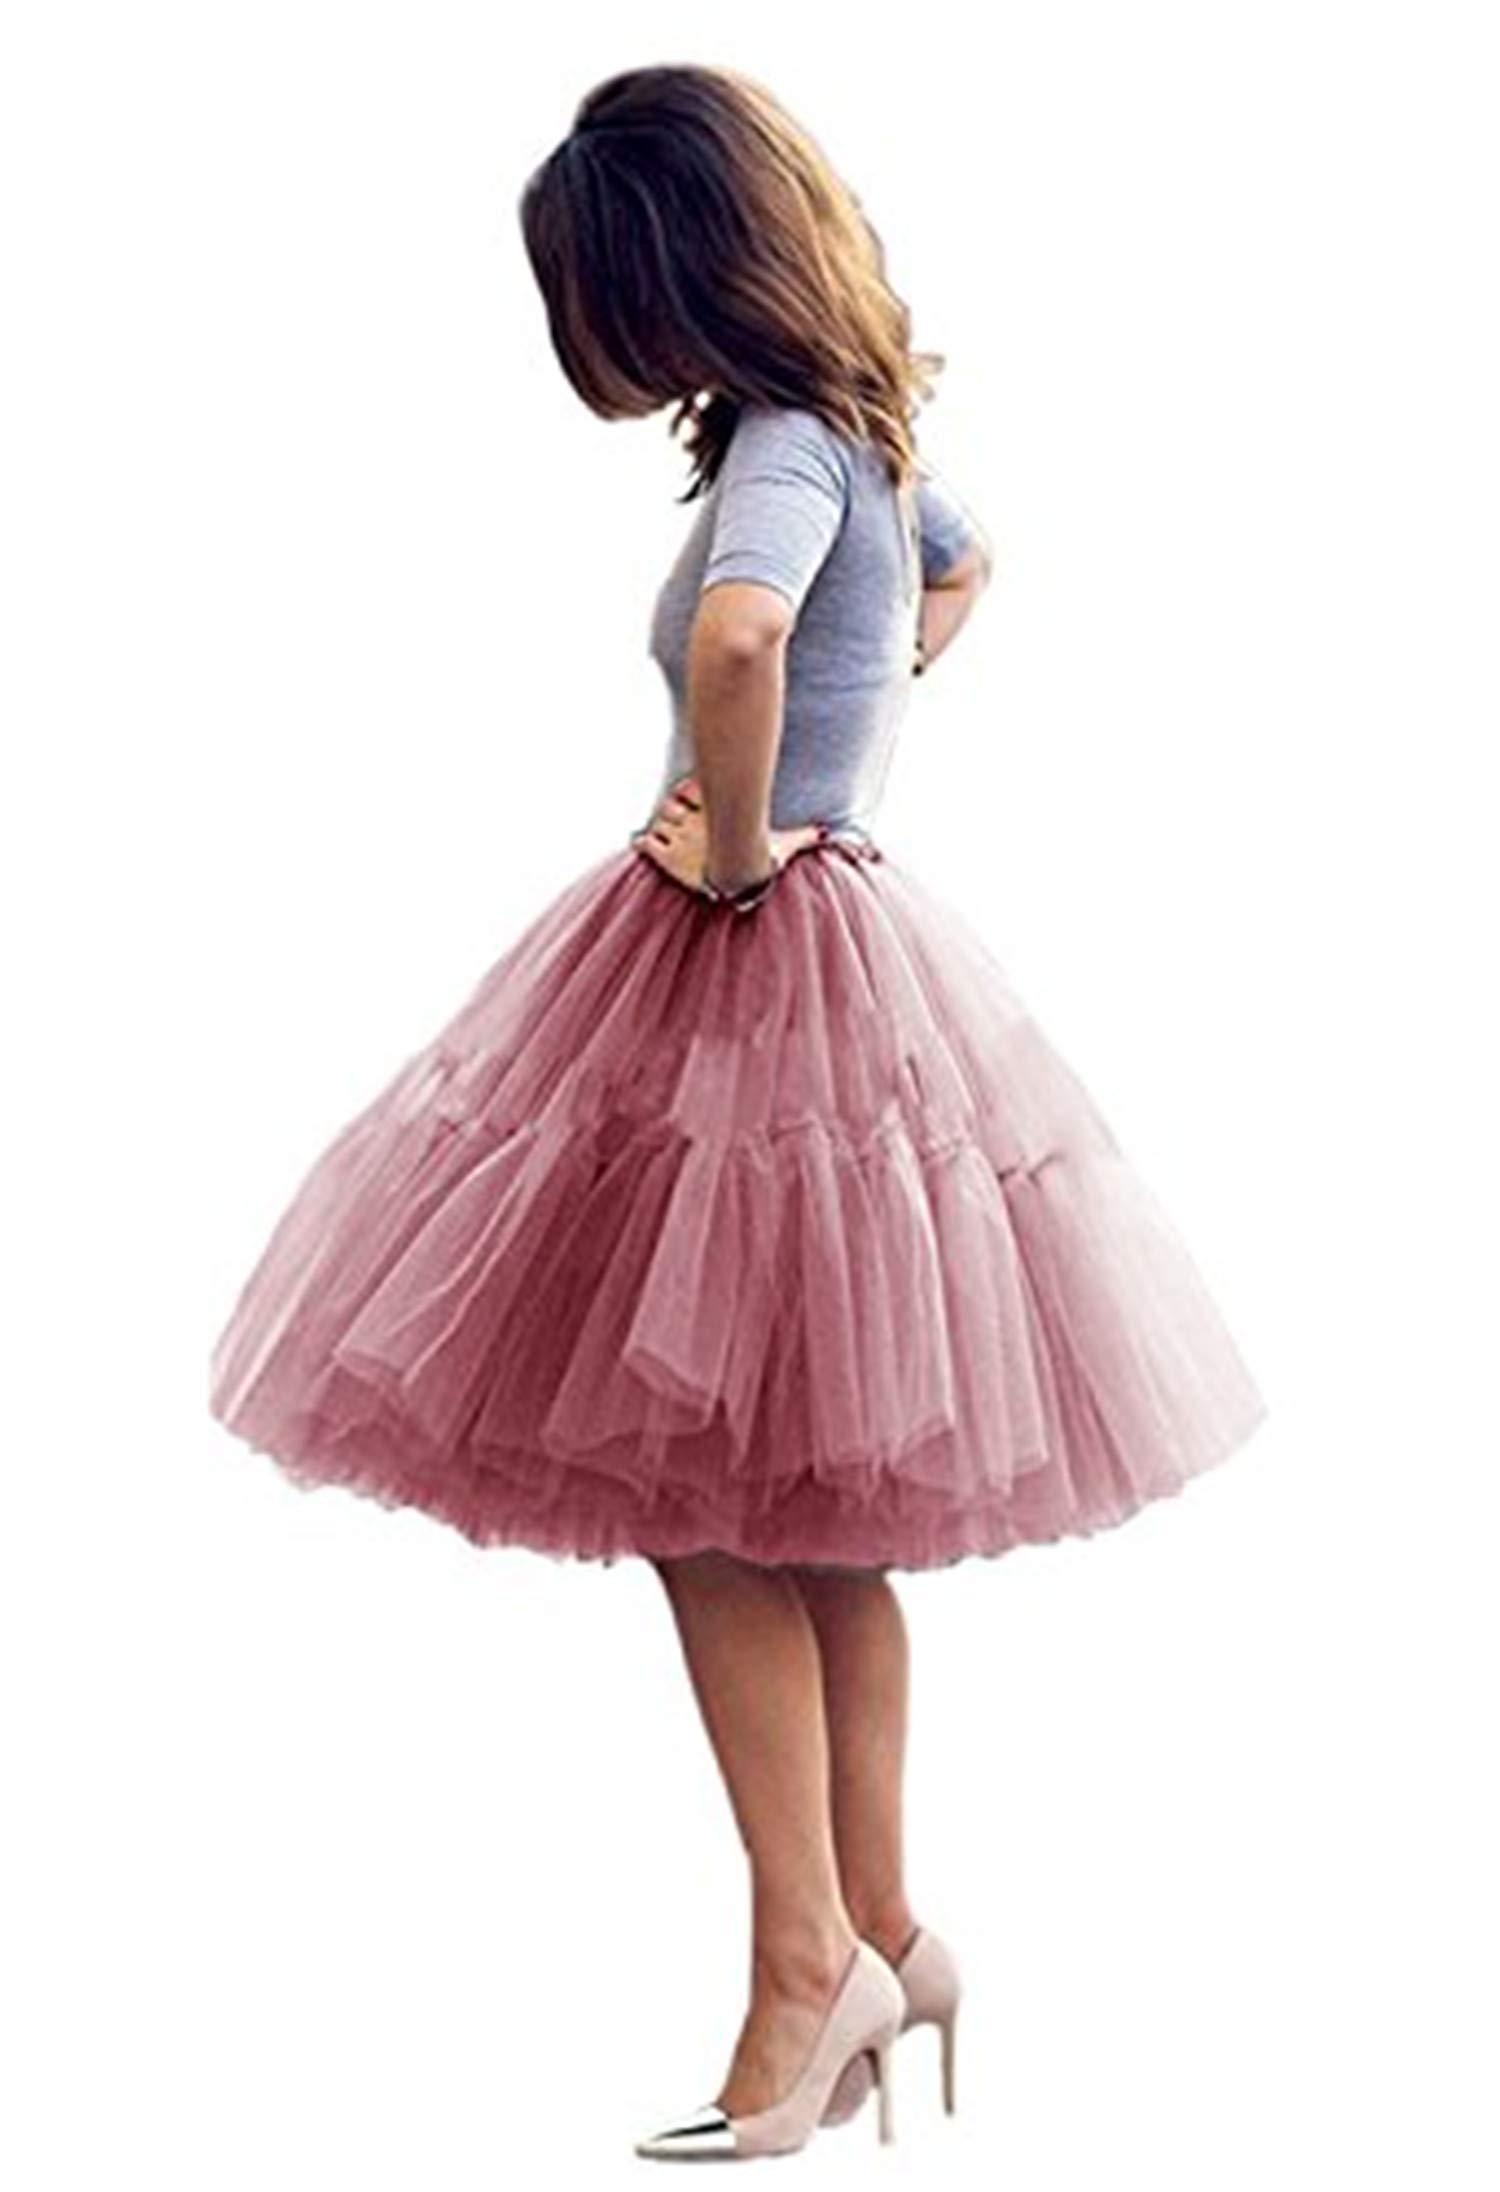 Tulle Skirt,Women's Midi Tulle Tutu Skirt Fluffy Princess Five Layers A line Party Prom Underskirt (Mauve, Waist:95cm-125cm)